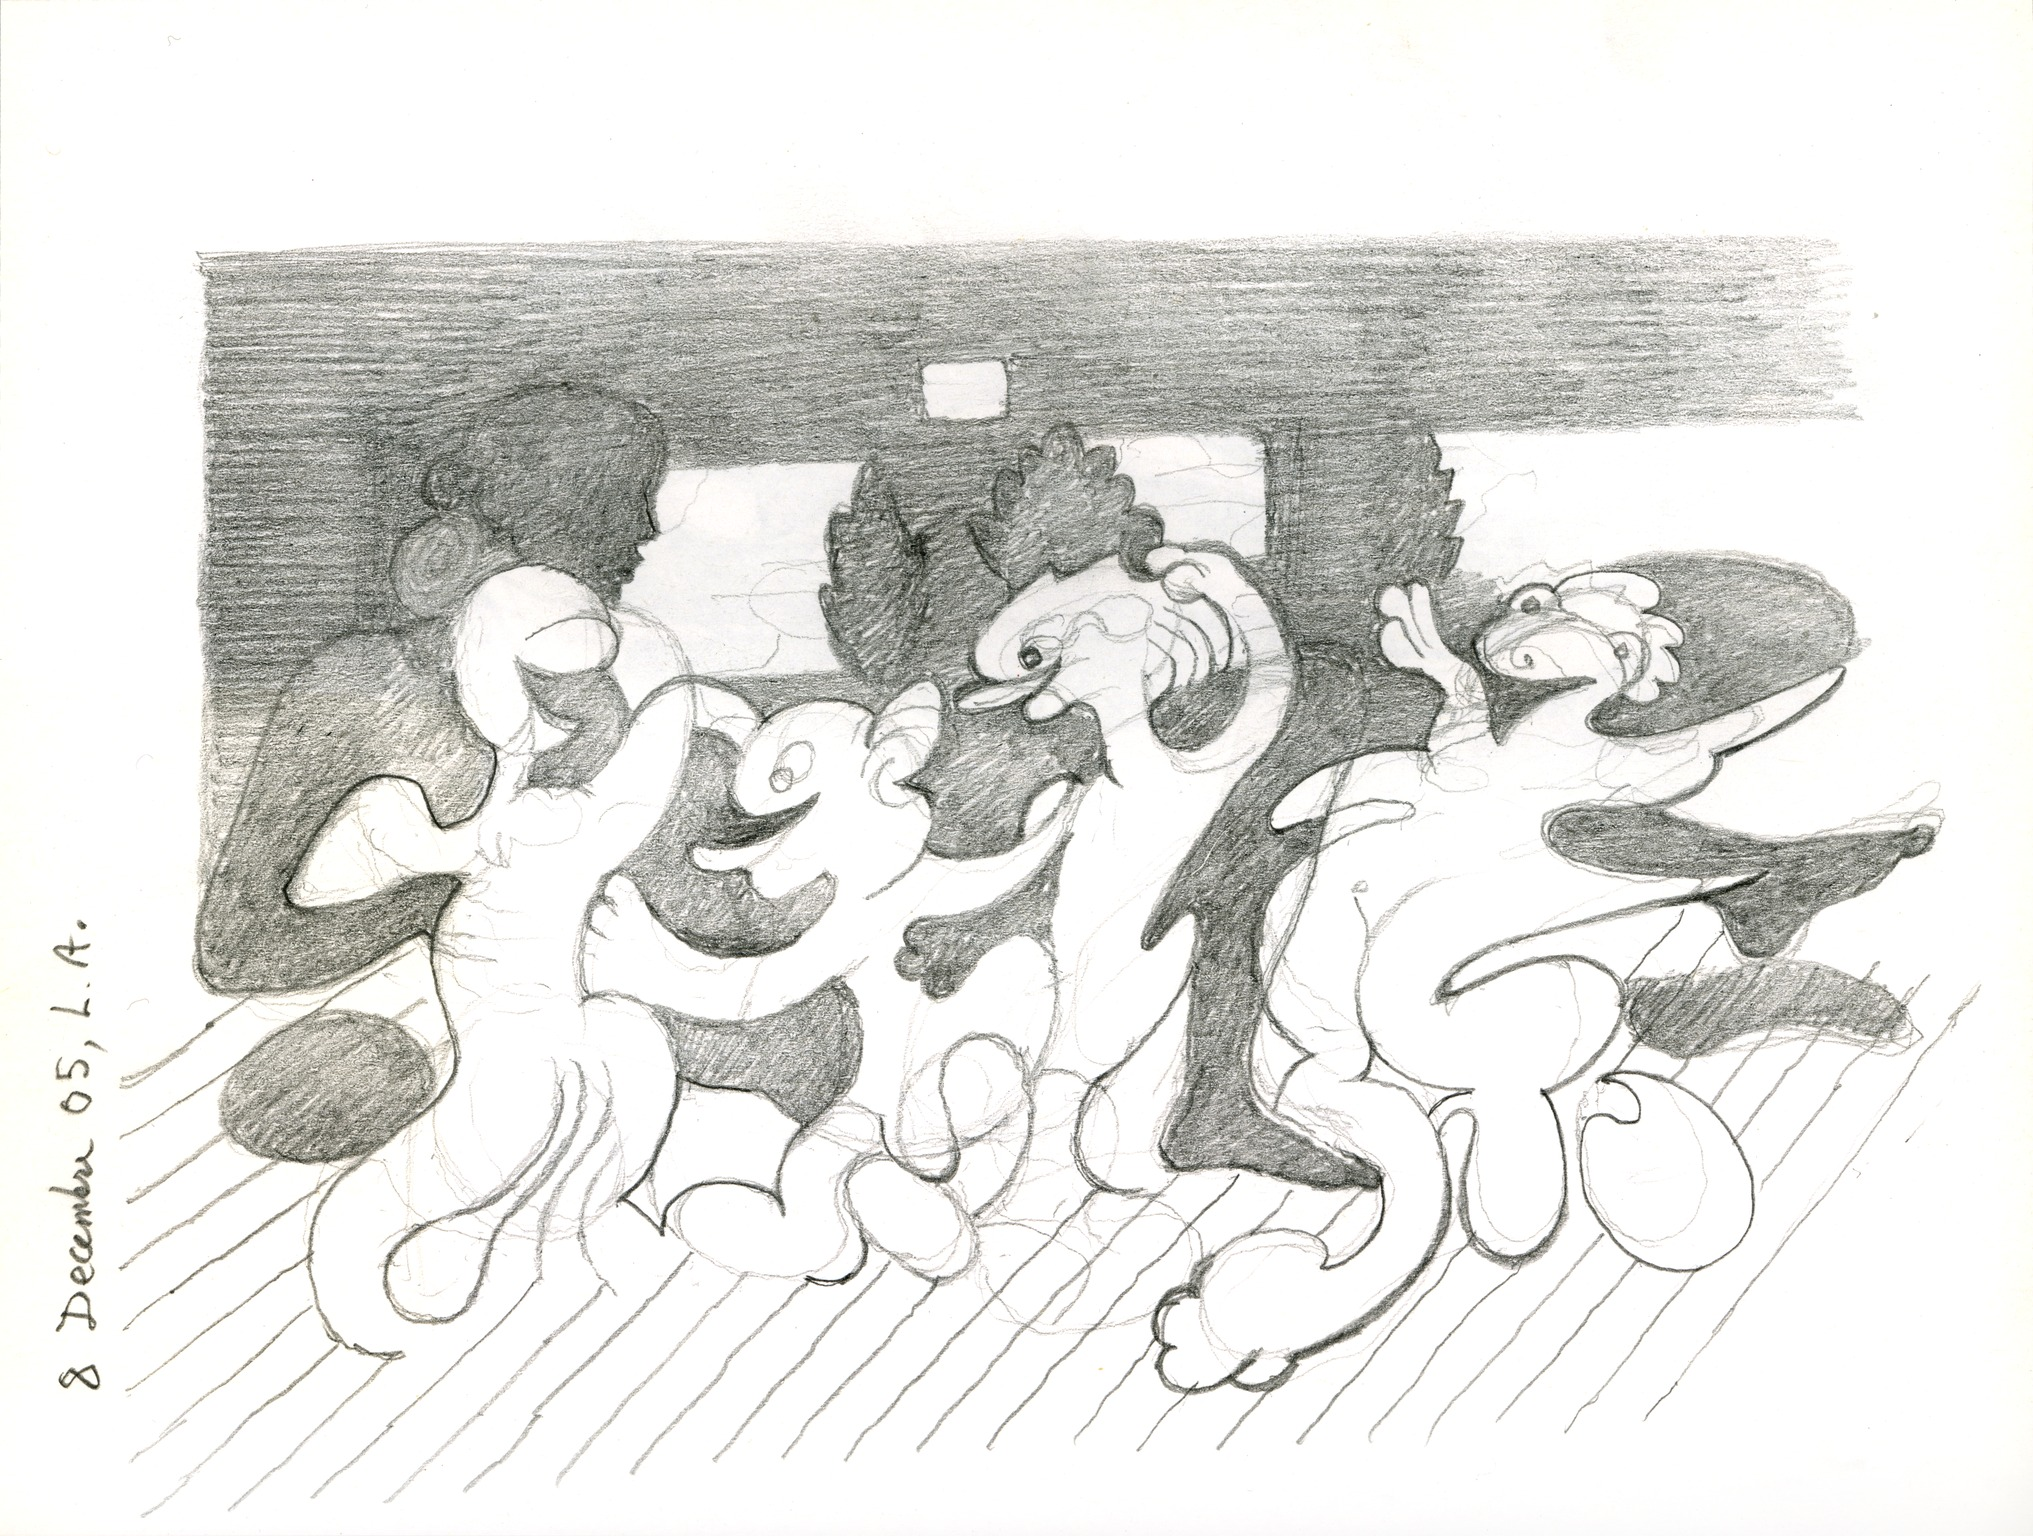 Untitled - 2005